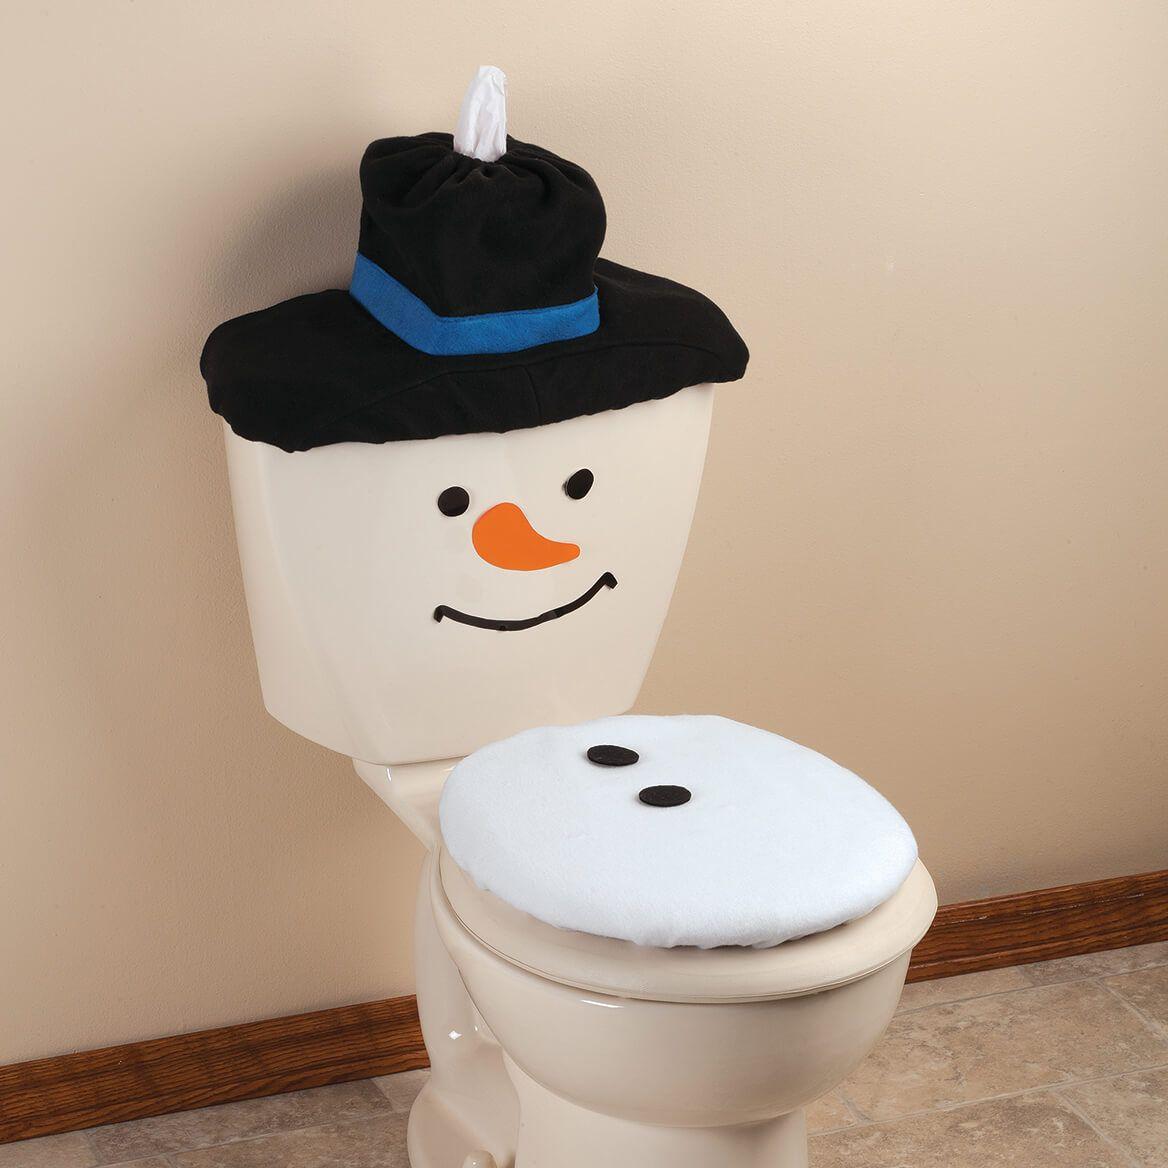 Snowman Toilet Cover-364584